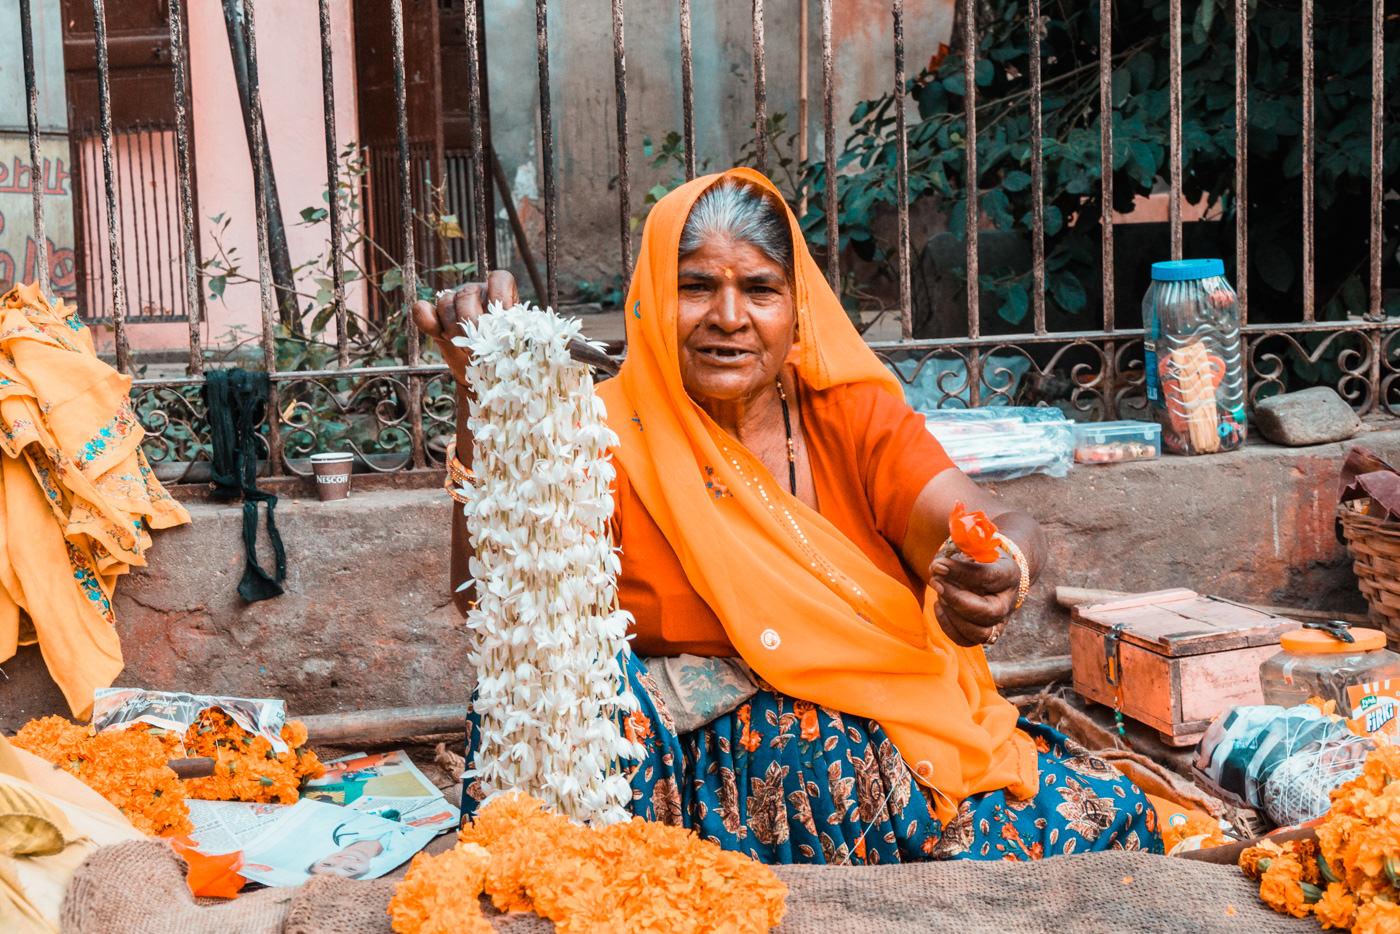 Blumenverkäuferin in Jaipur, Indien